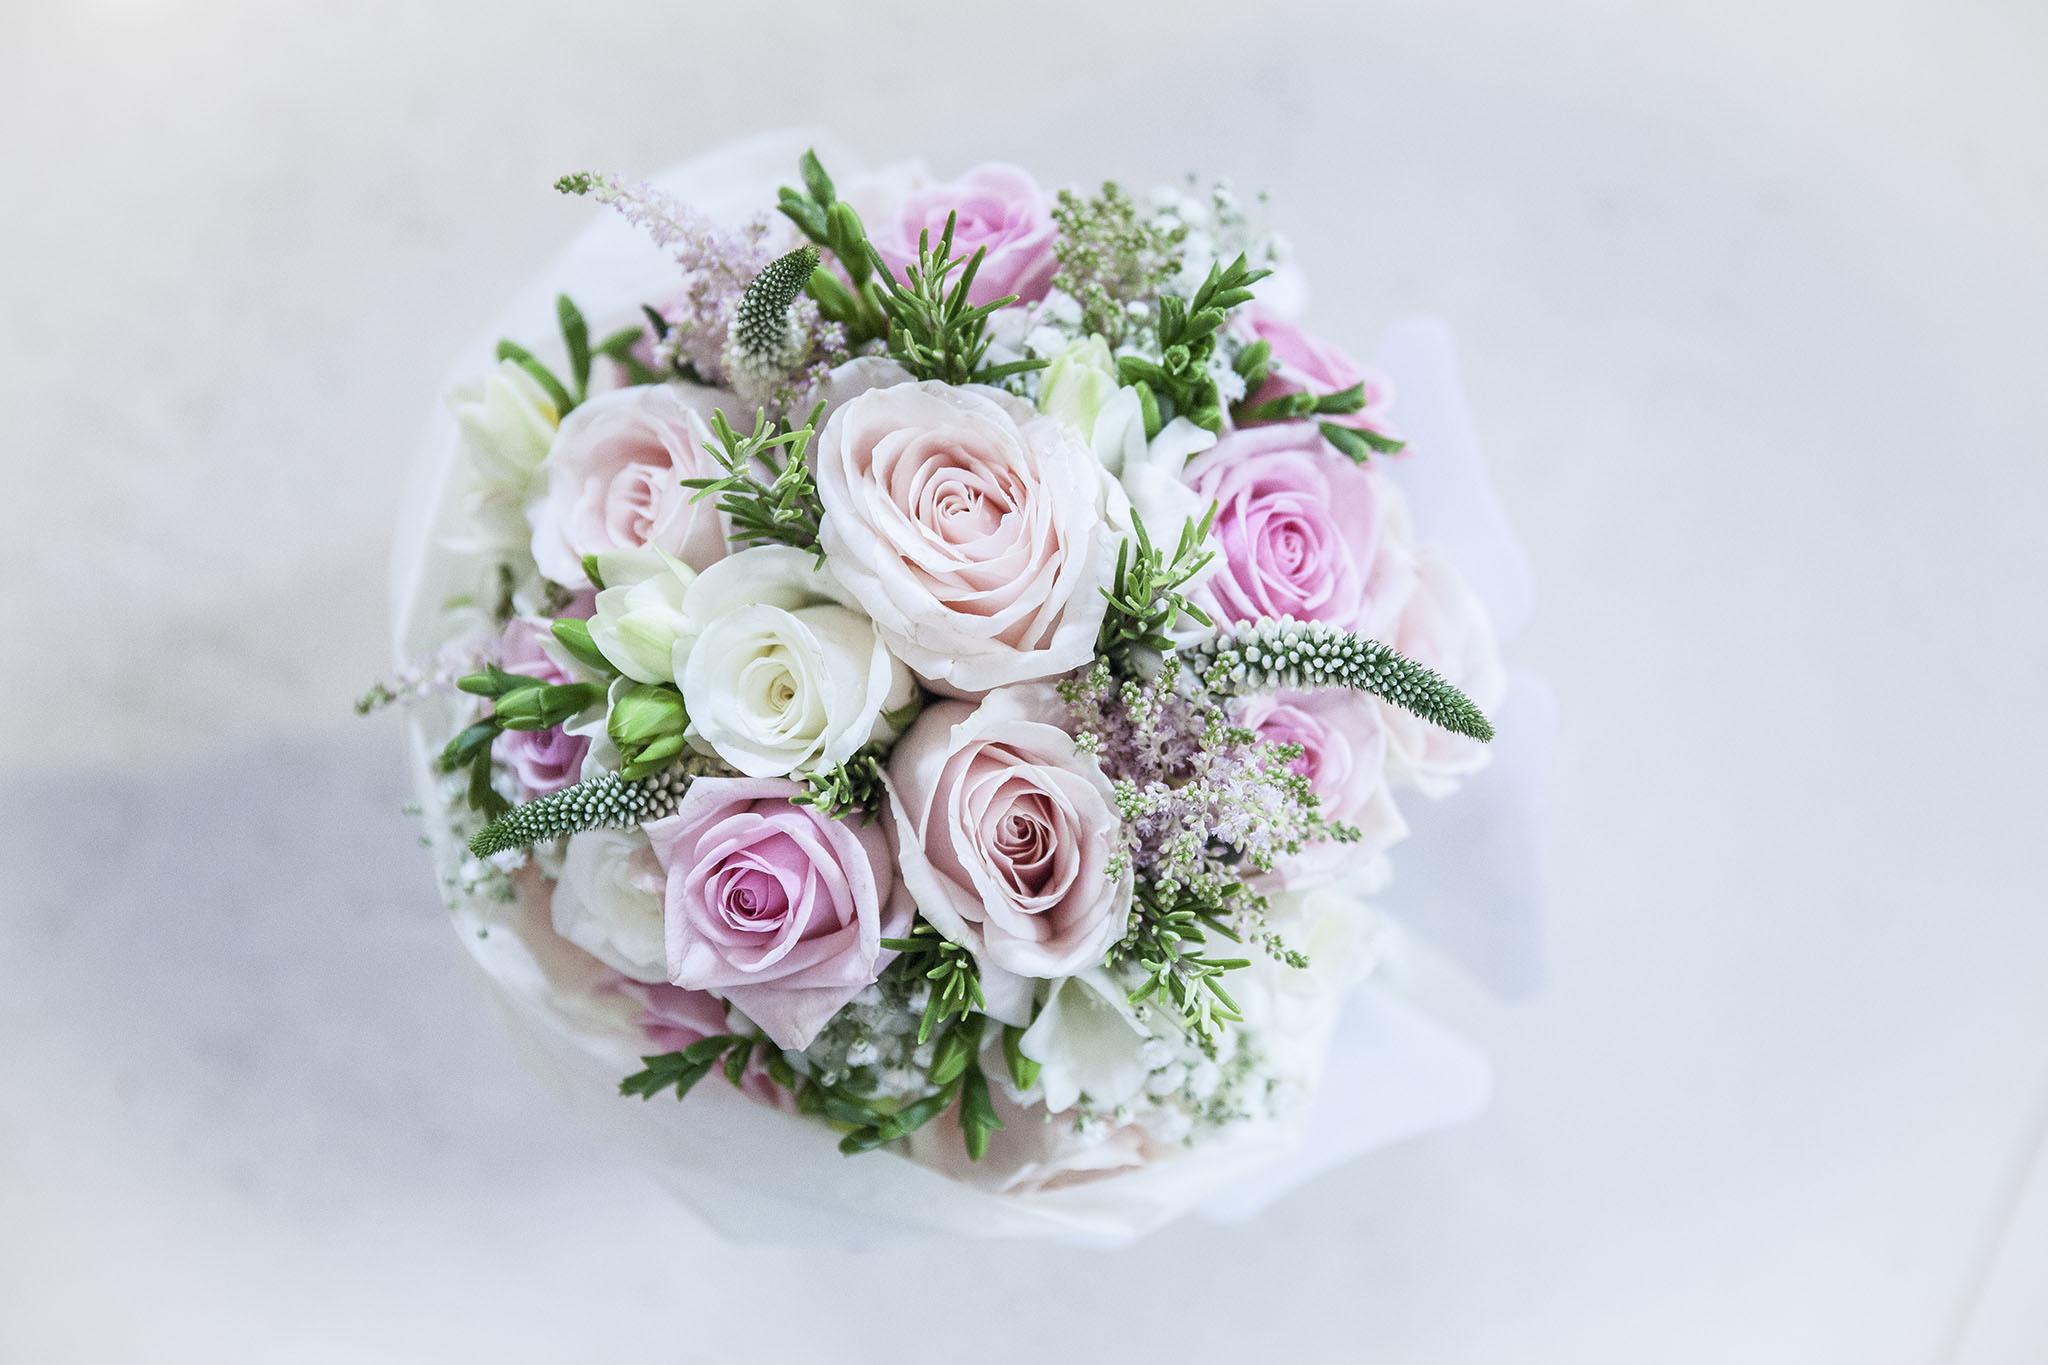 elizabethgphotography_kingslangley_hertfordshire_fineart_wedding_tewinbury_farm_tayna_05.jpg